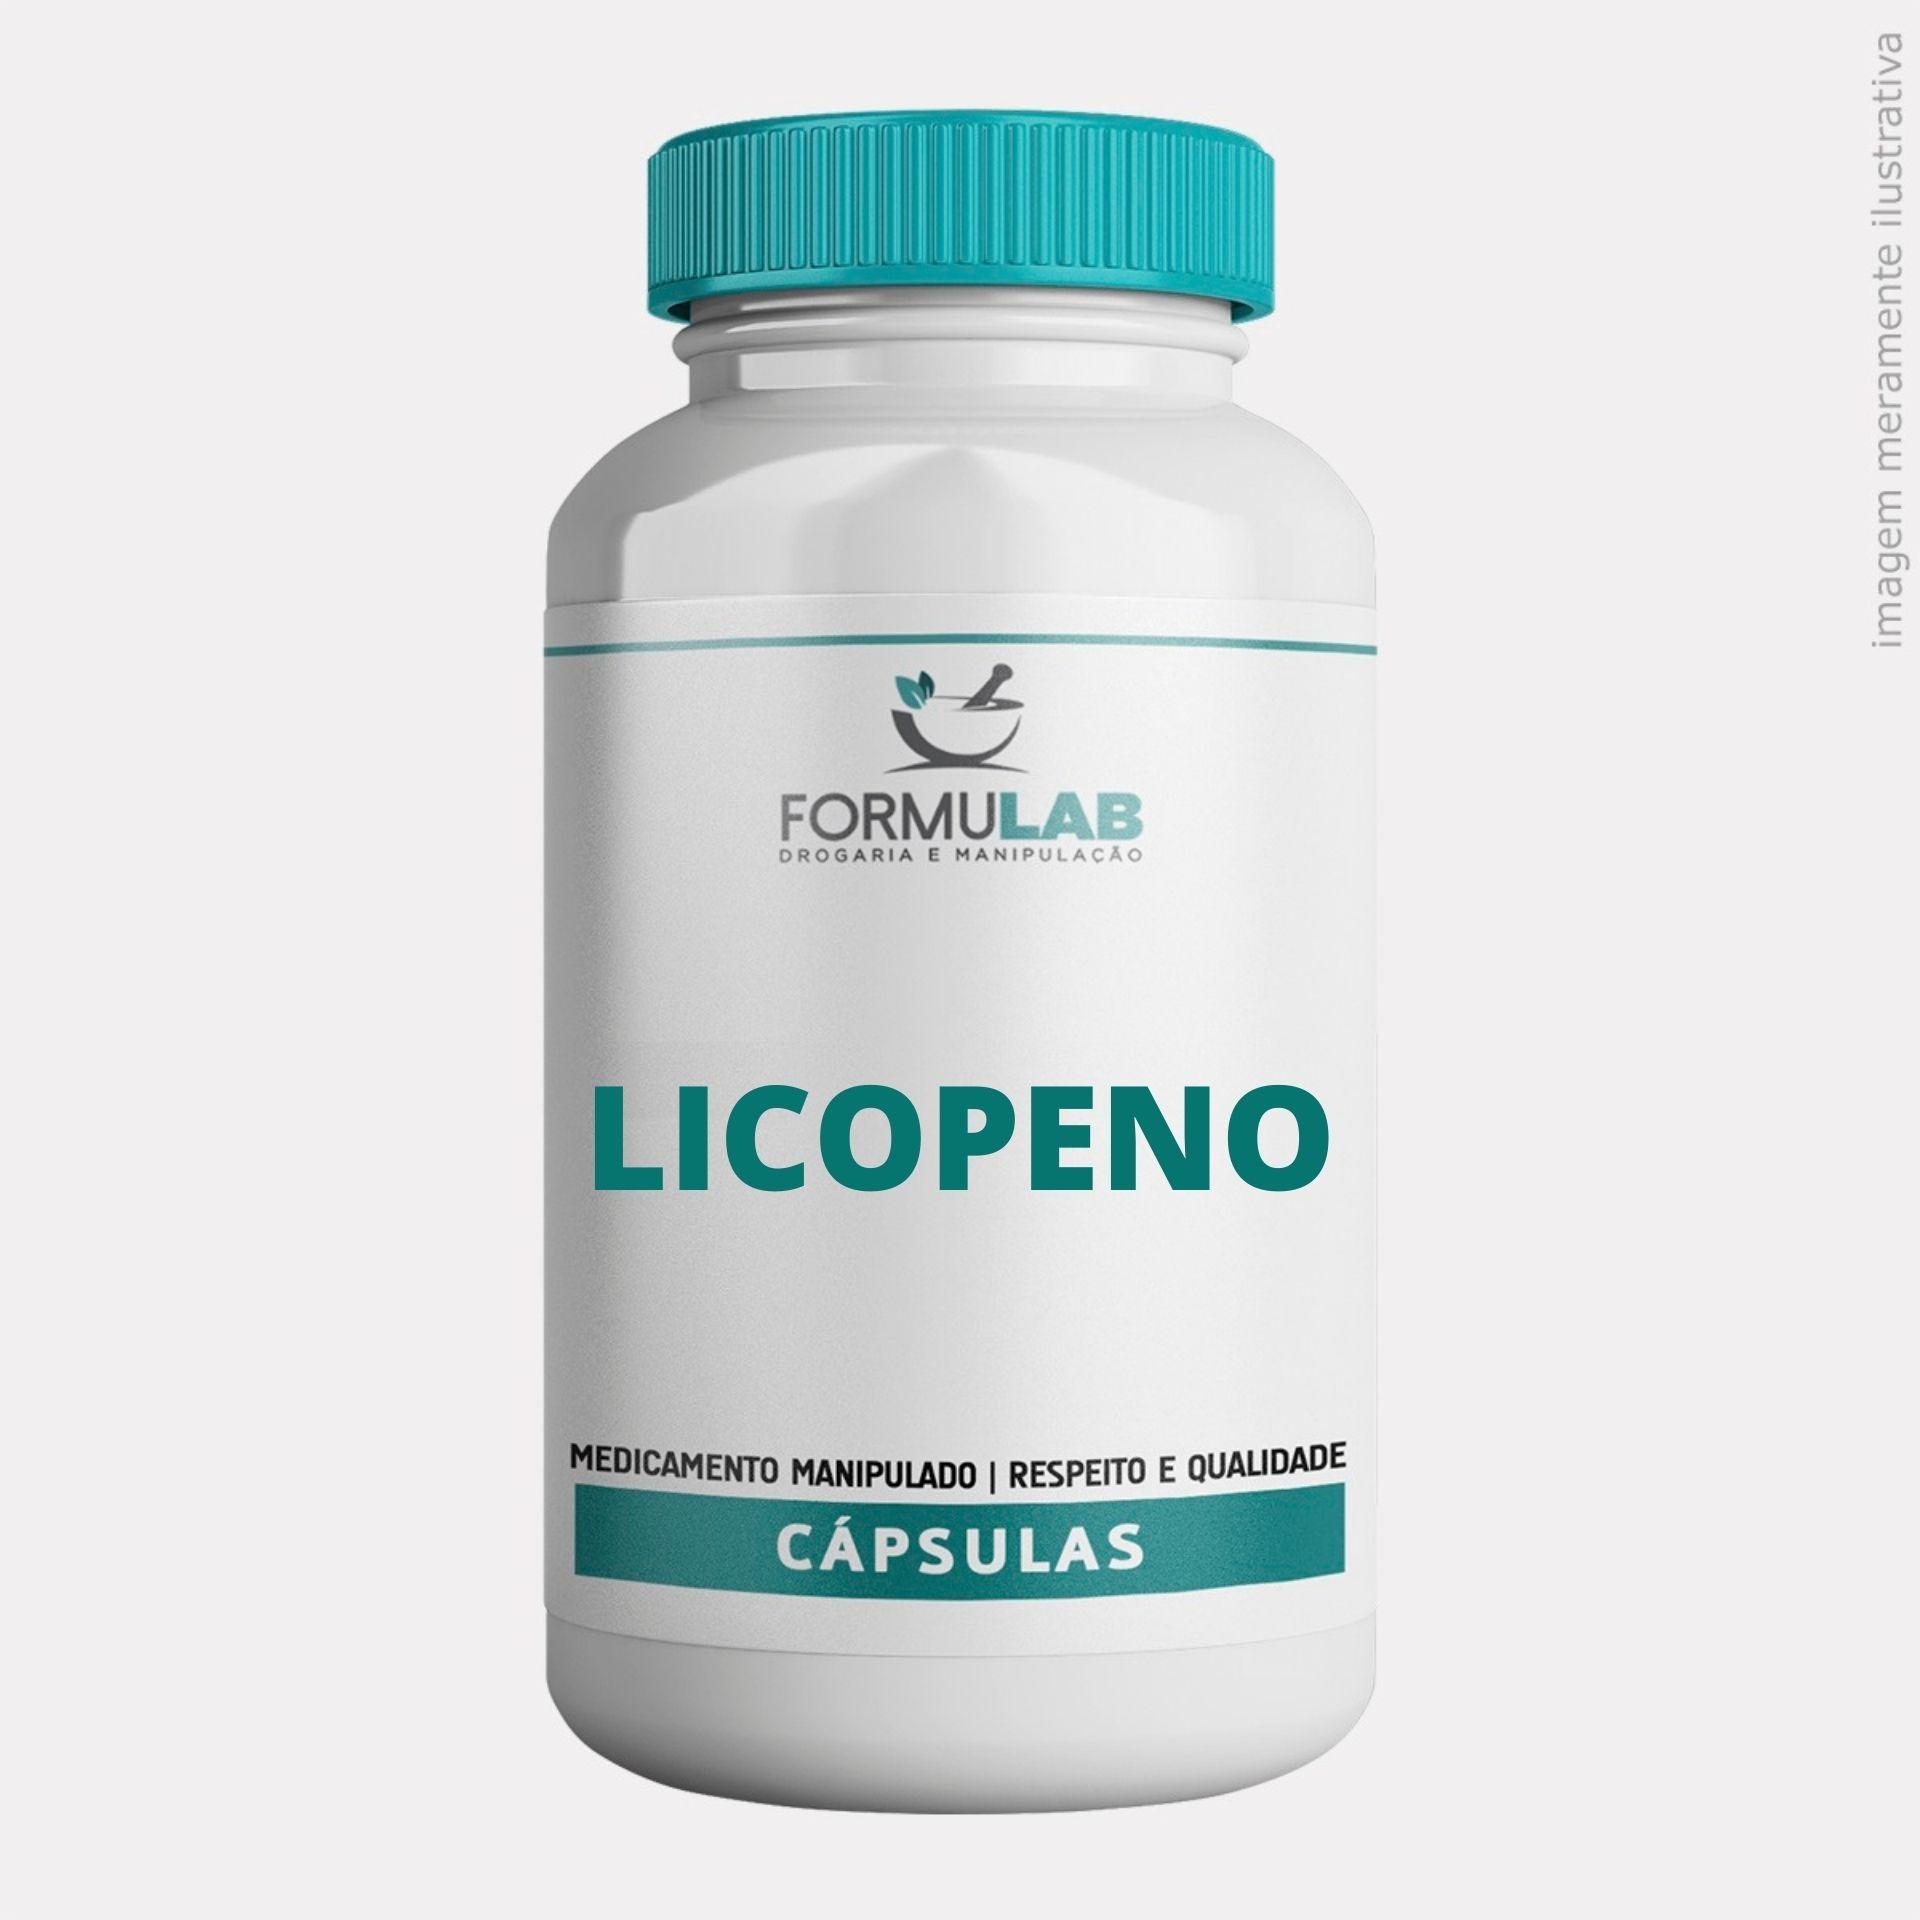 Licopeno 5mg - Lycopersicum